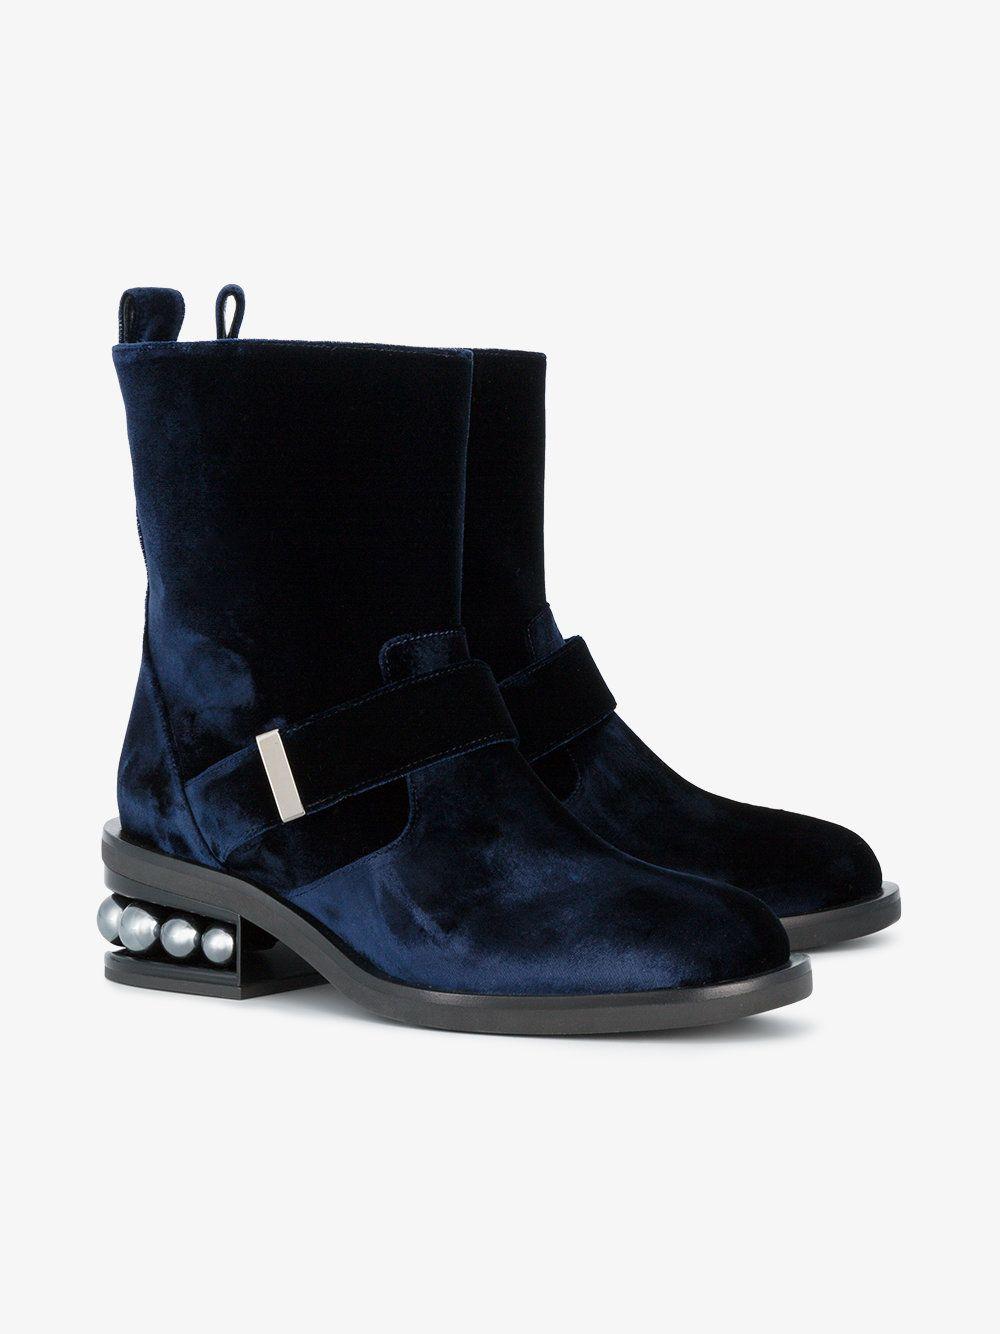 Nicholas Kirkwood Velvet Casati Pearl Boots yCsXU